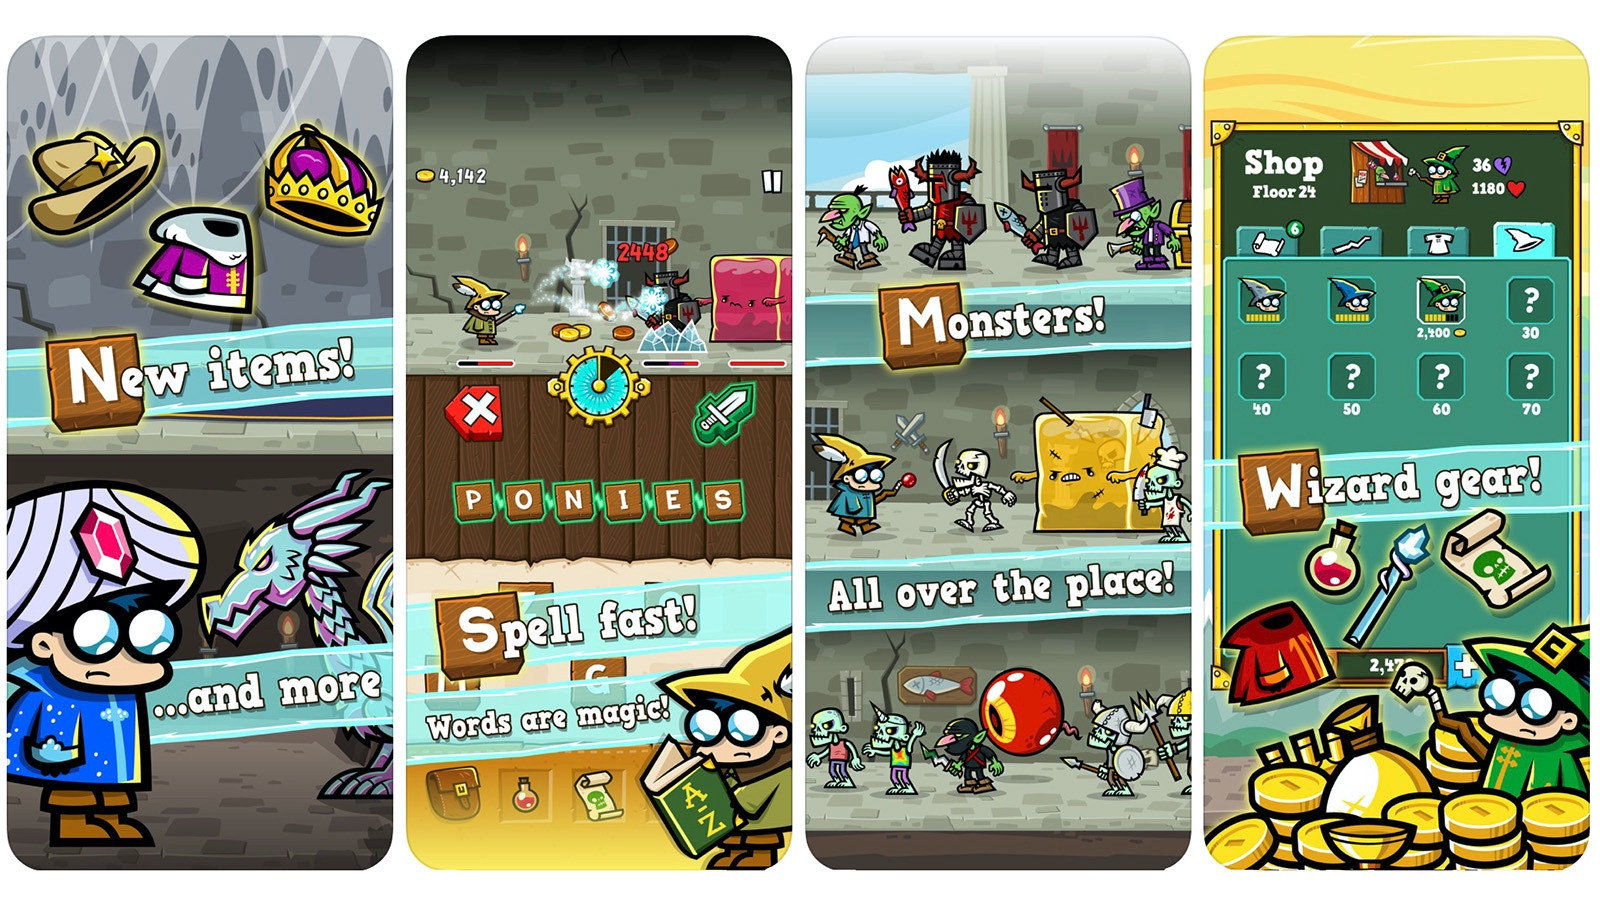 Spellspire game screenshot